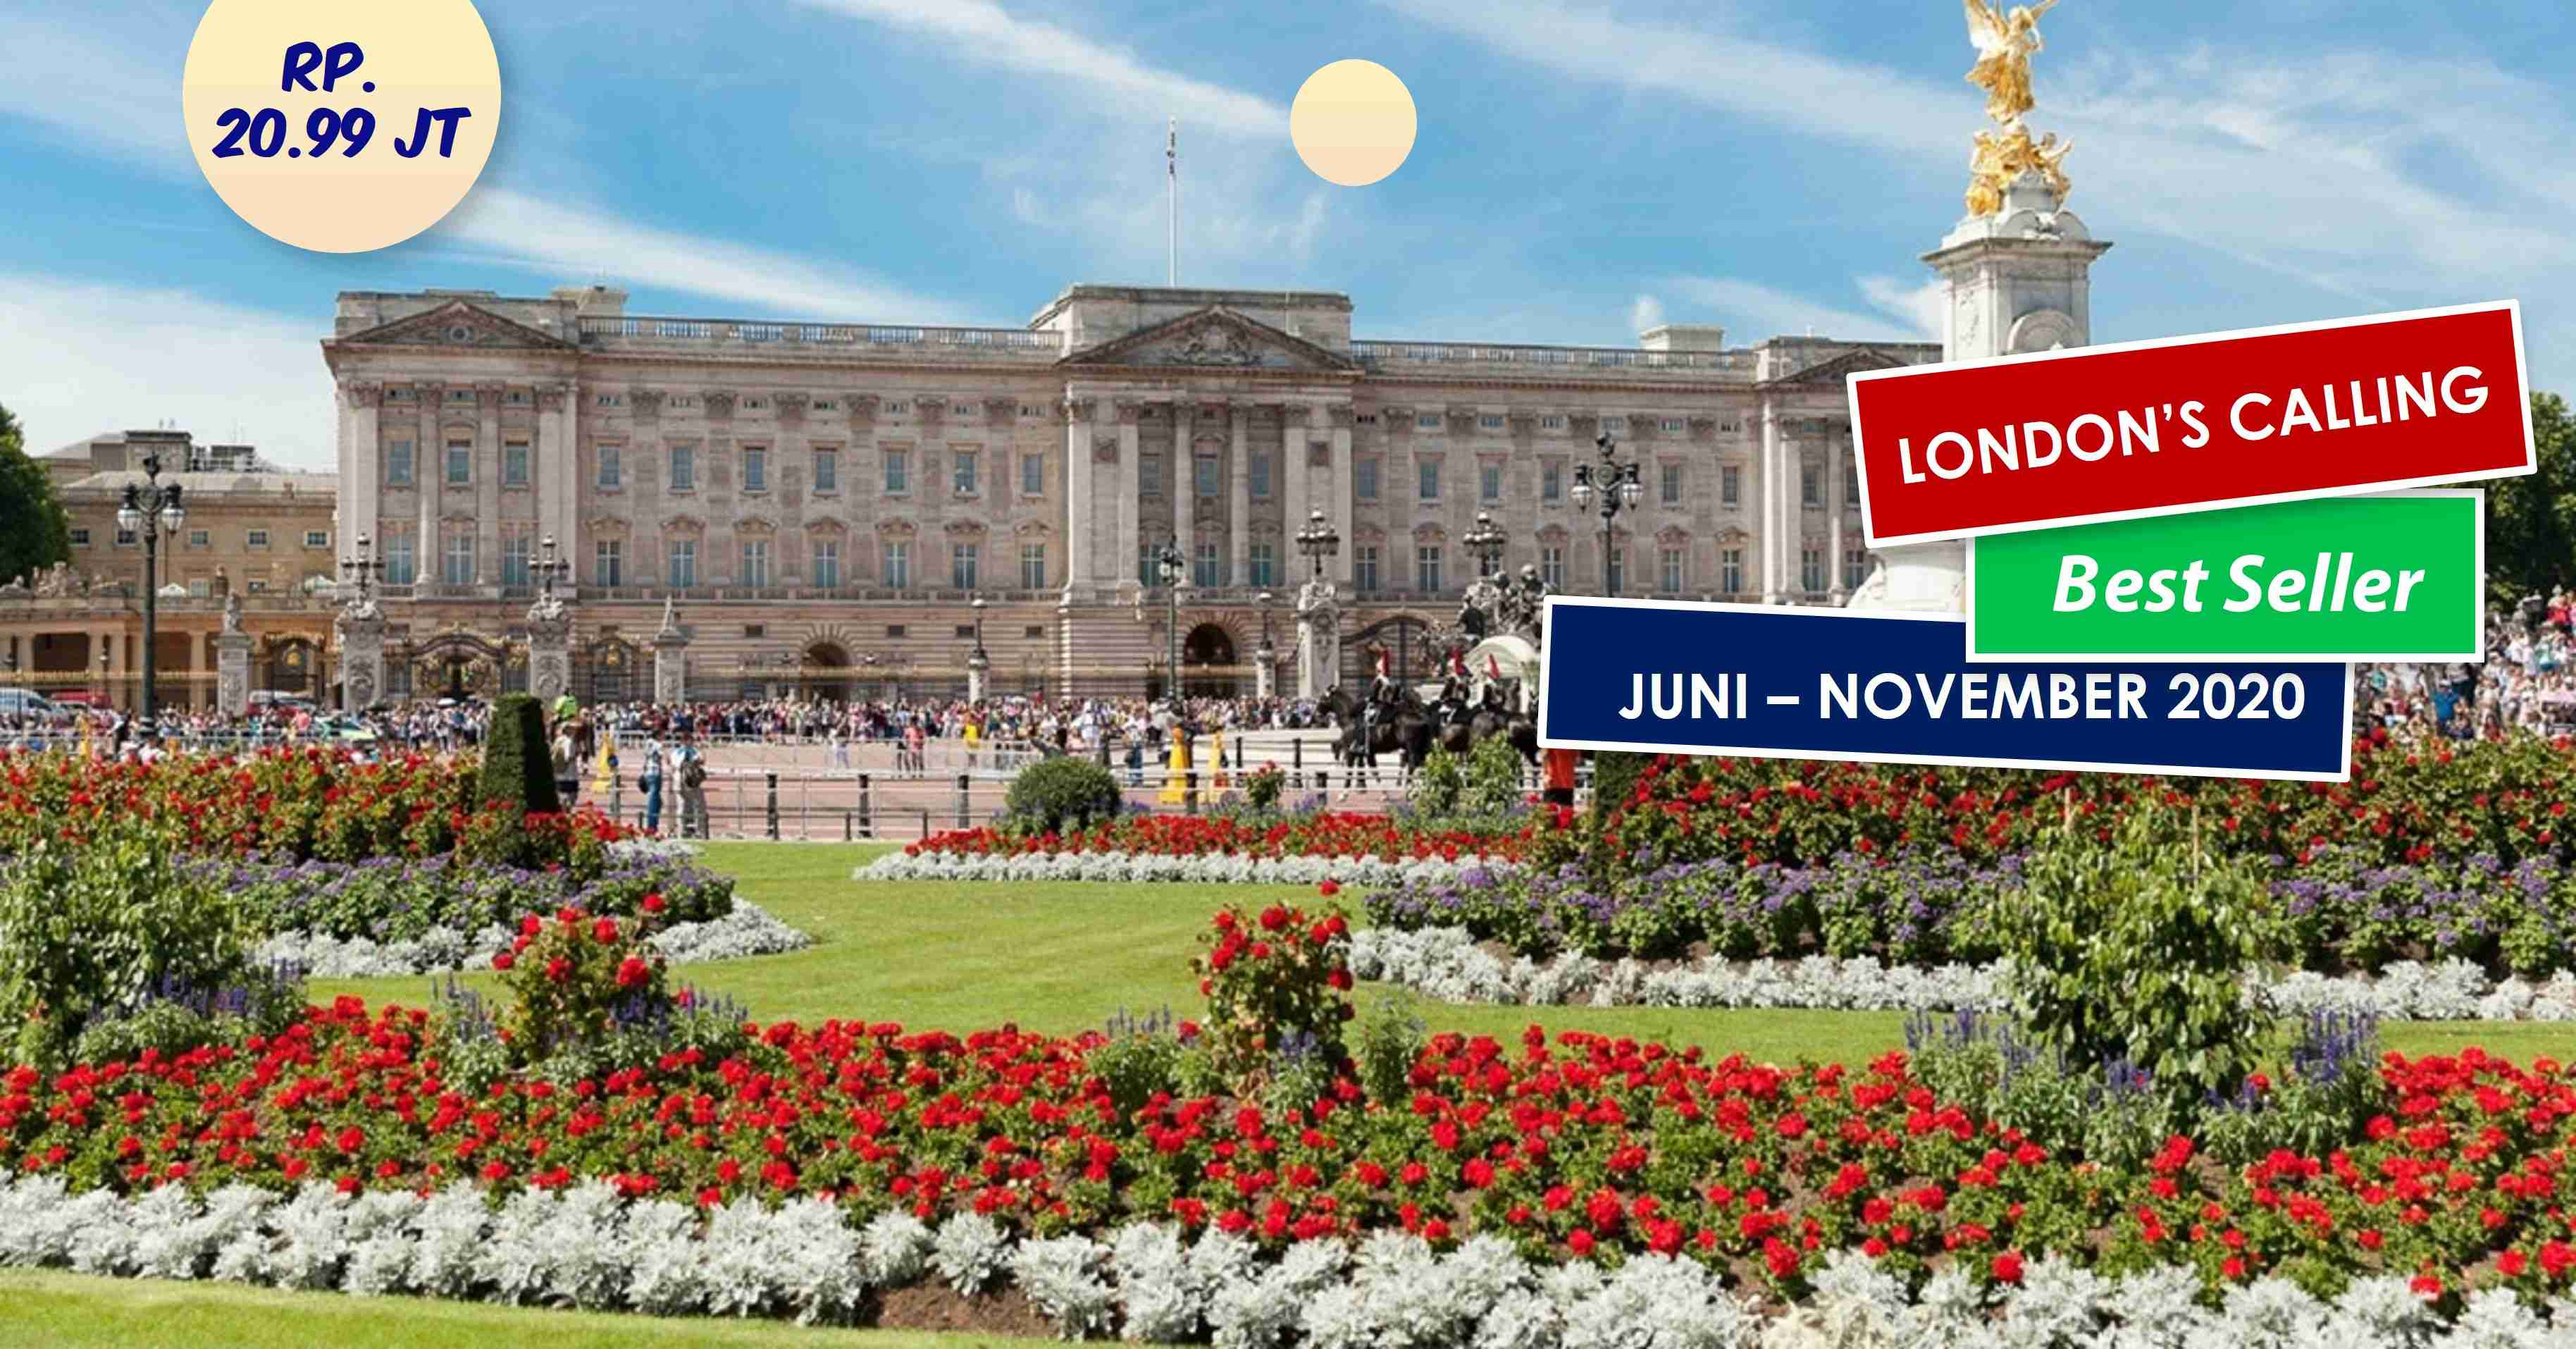 11D London's Calling Juni - November 2020